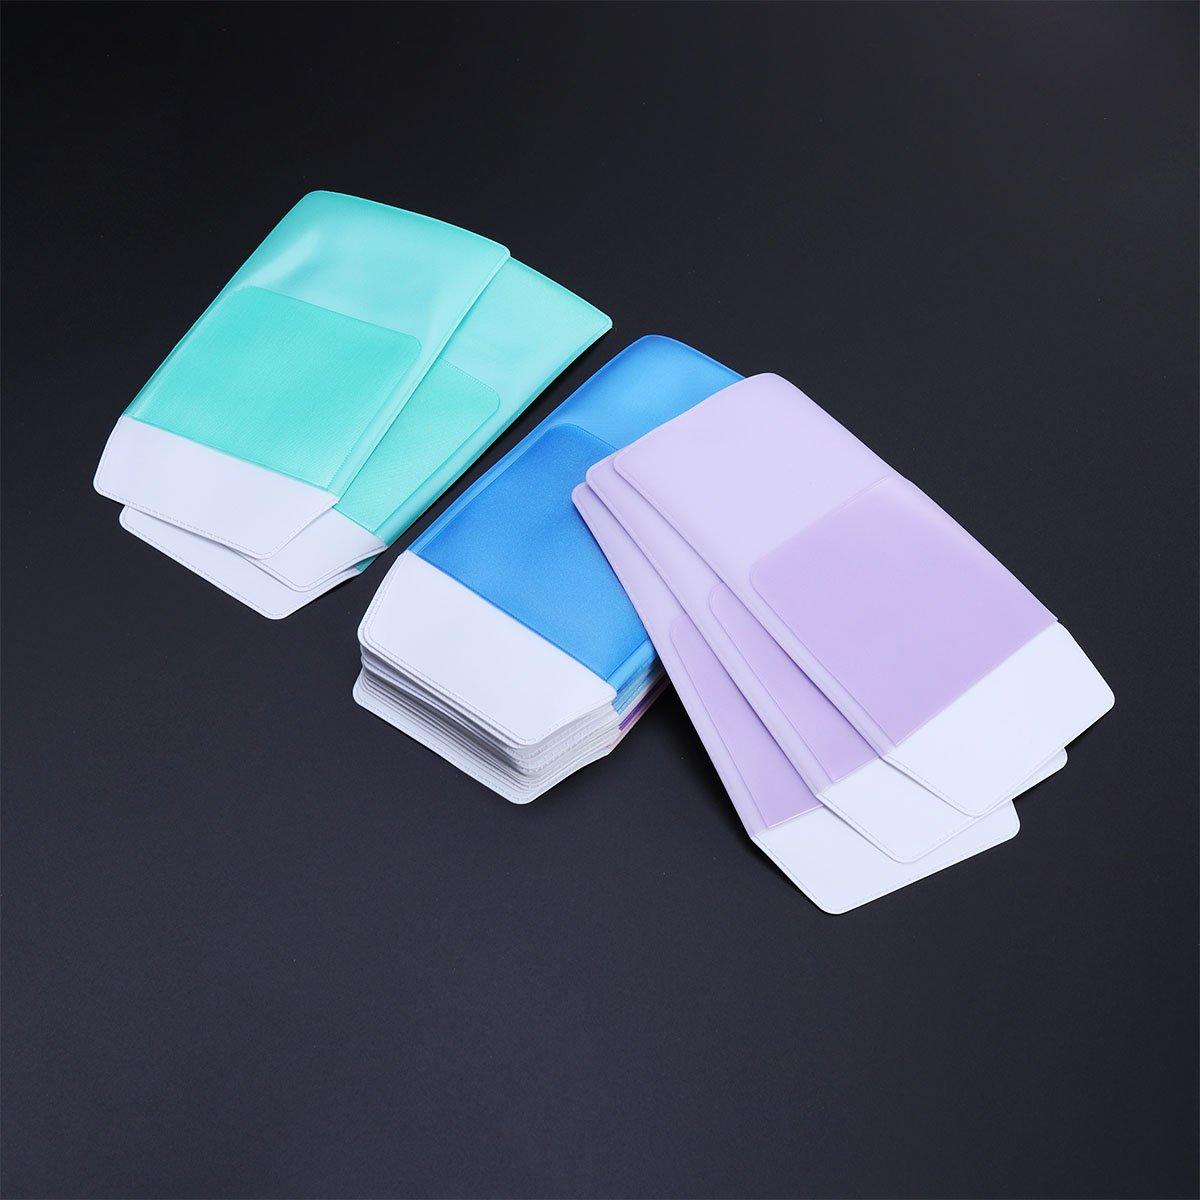 6 St/ück YEAHIBABY Sortierte Farbe Pocket Protectors Mehrzweck Pen Bag f/ür Pen Leaks f/ür Schule Krankenhaus B/üro